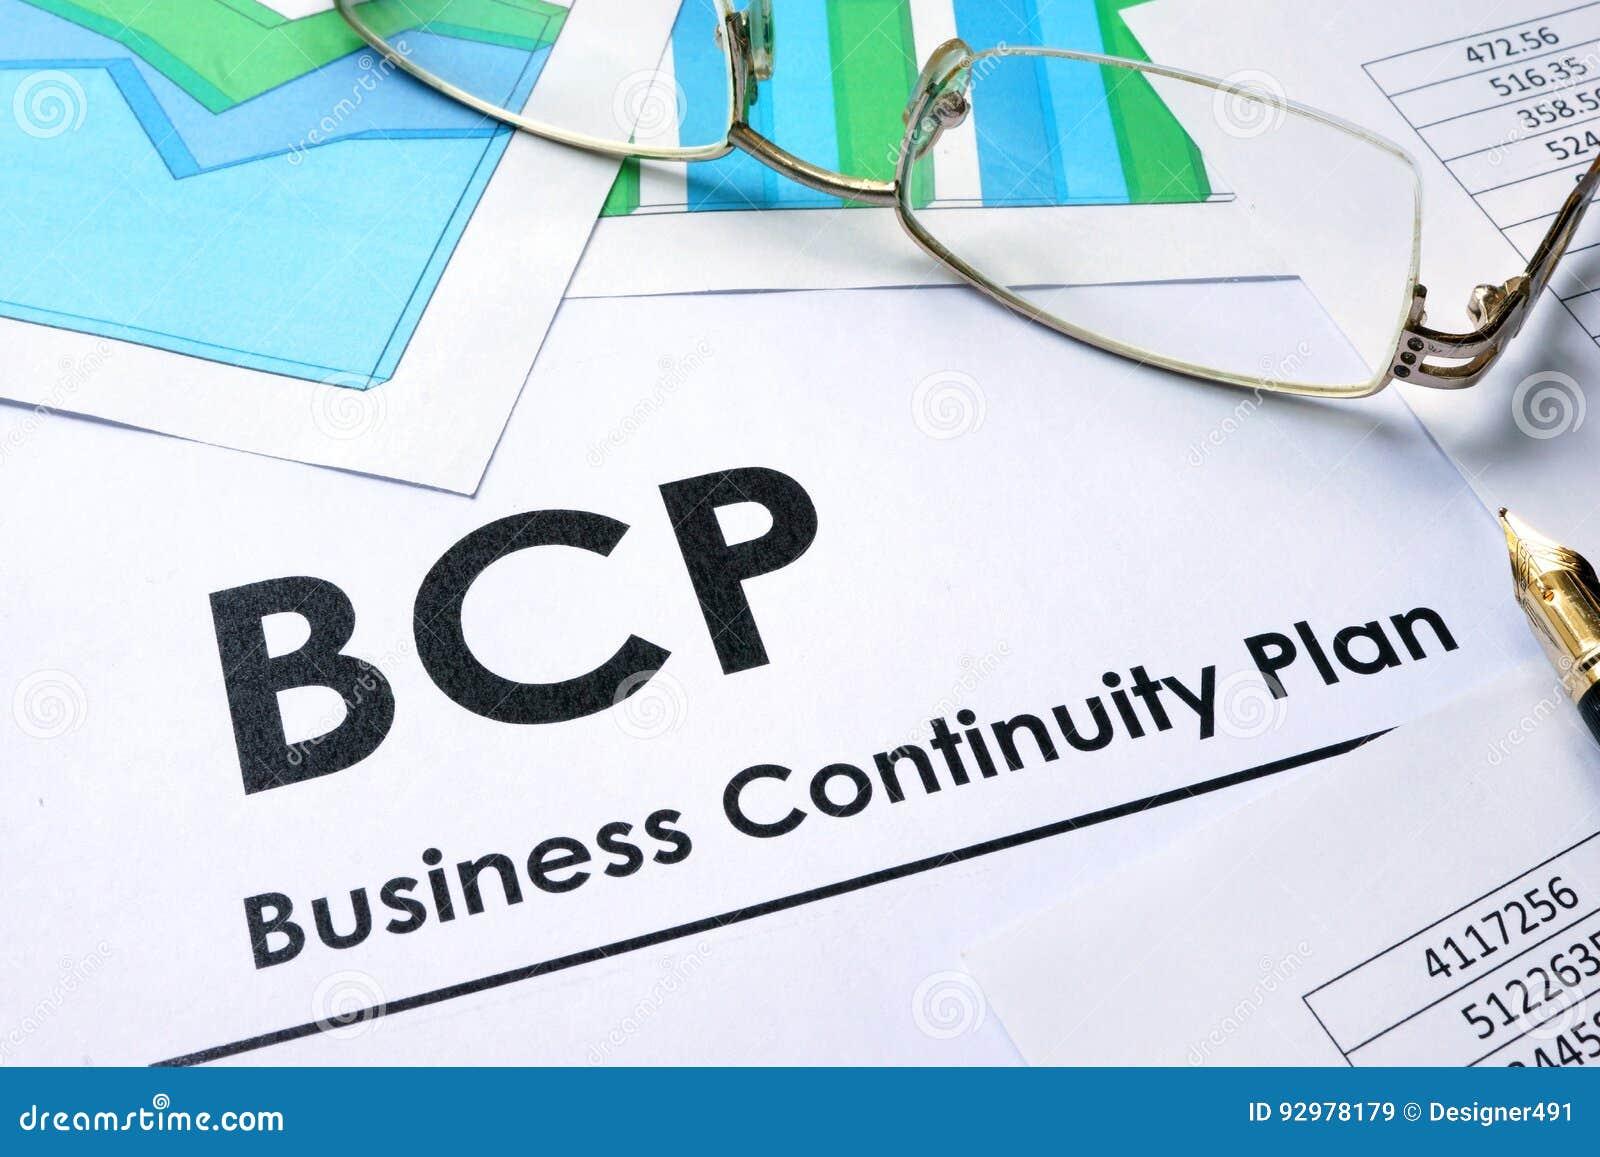 Business continuity plan help desk